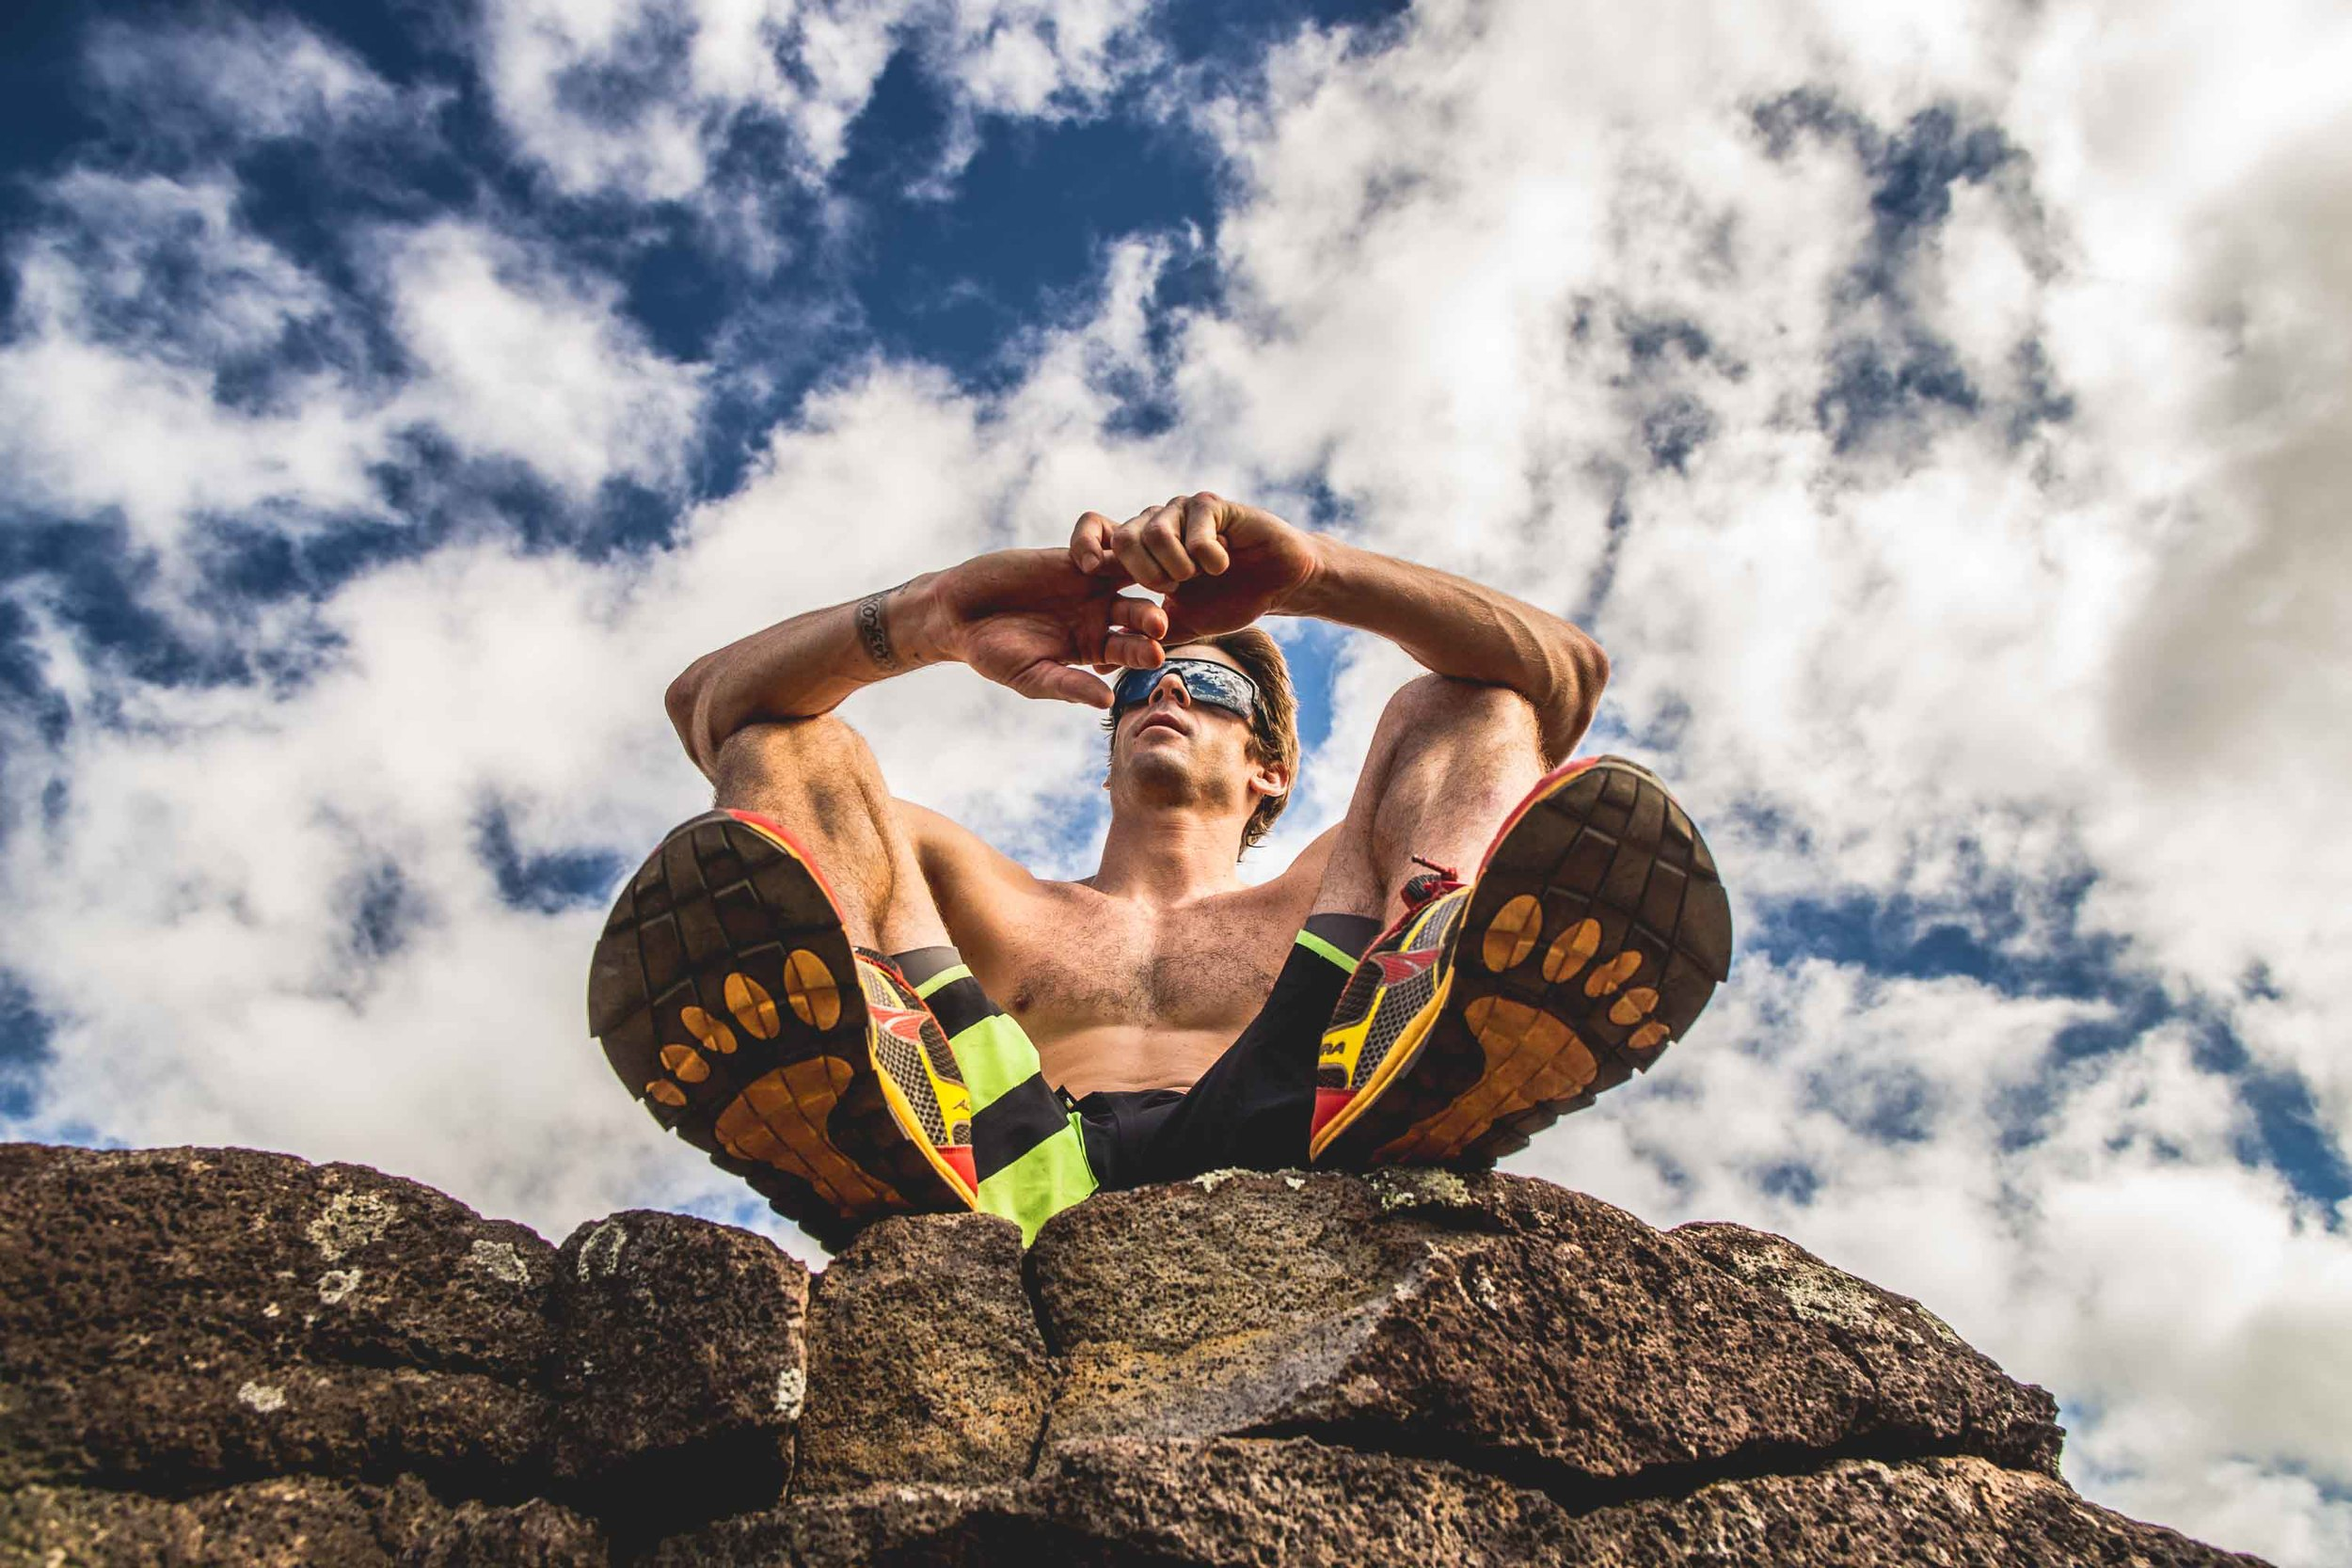 bryce-johnson-Moving Man-running-trails-hawaii-glee-actor-jake pembrook-4.jpg